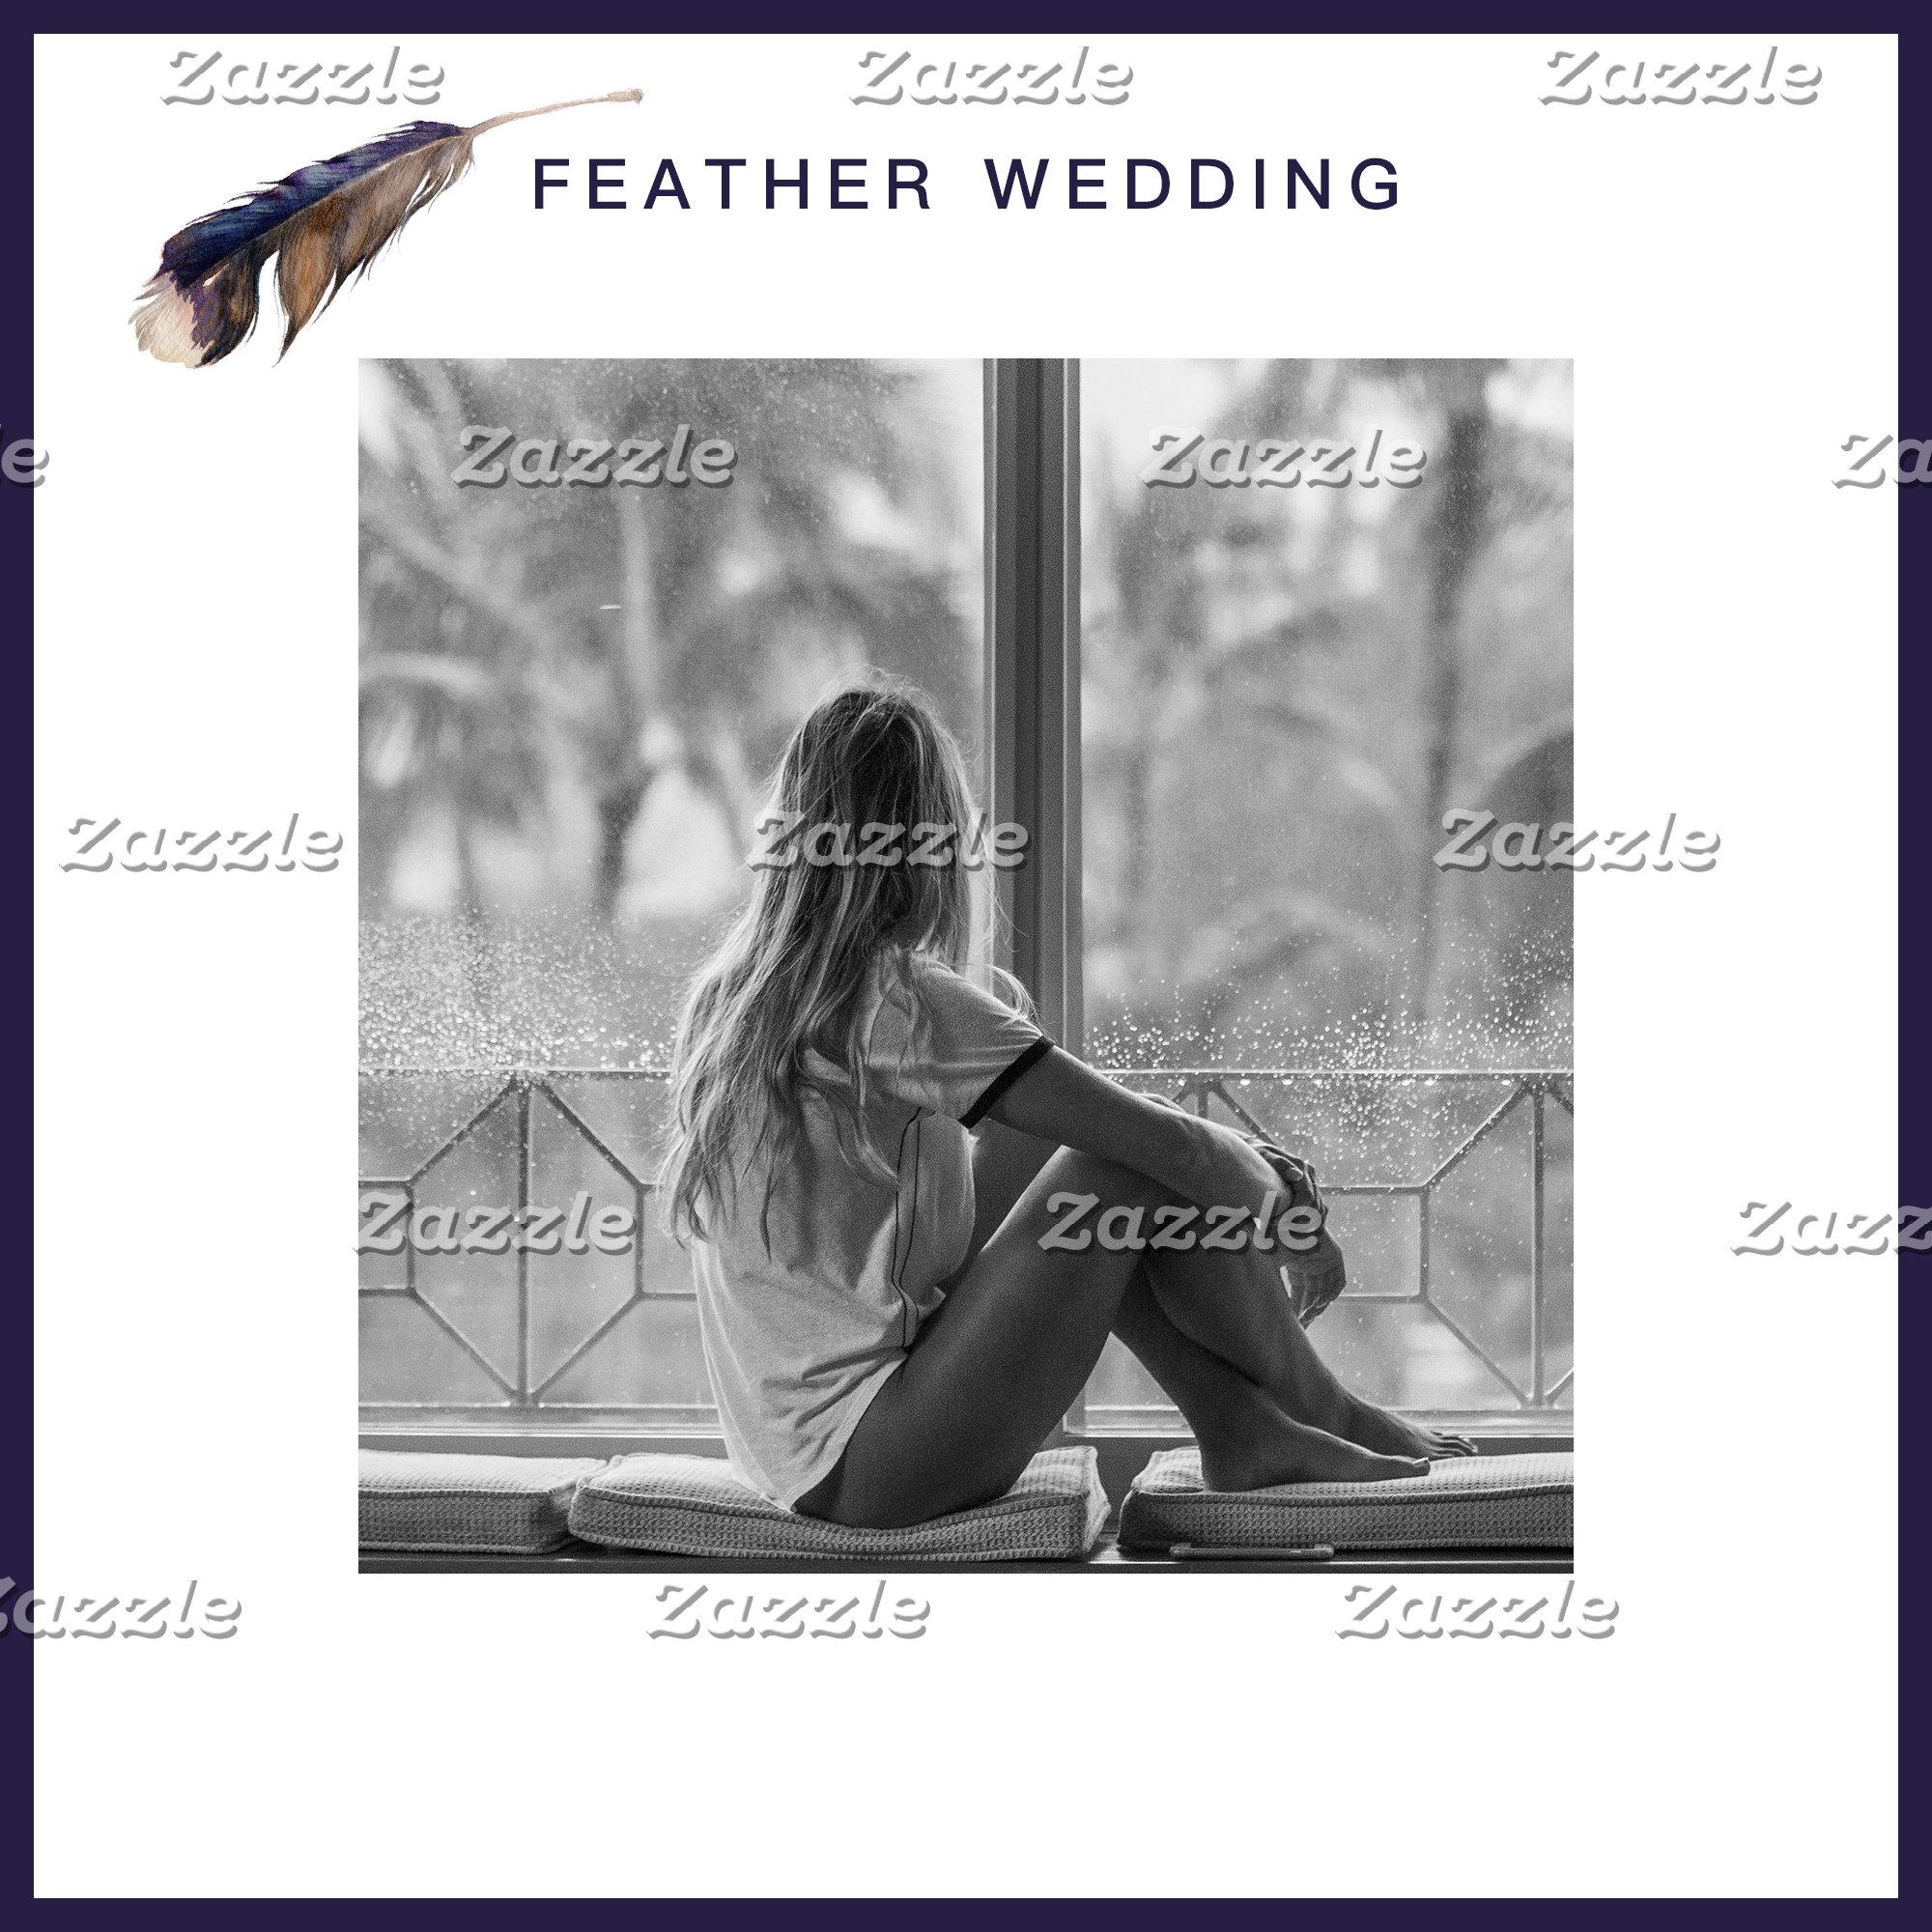 Feather Wedding